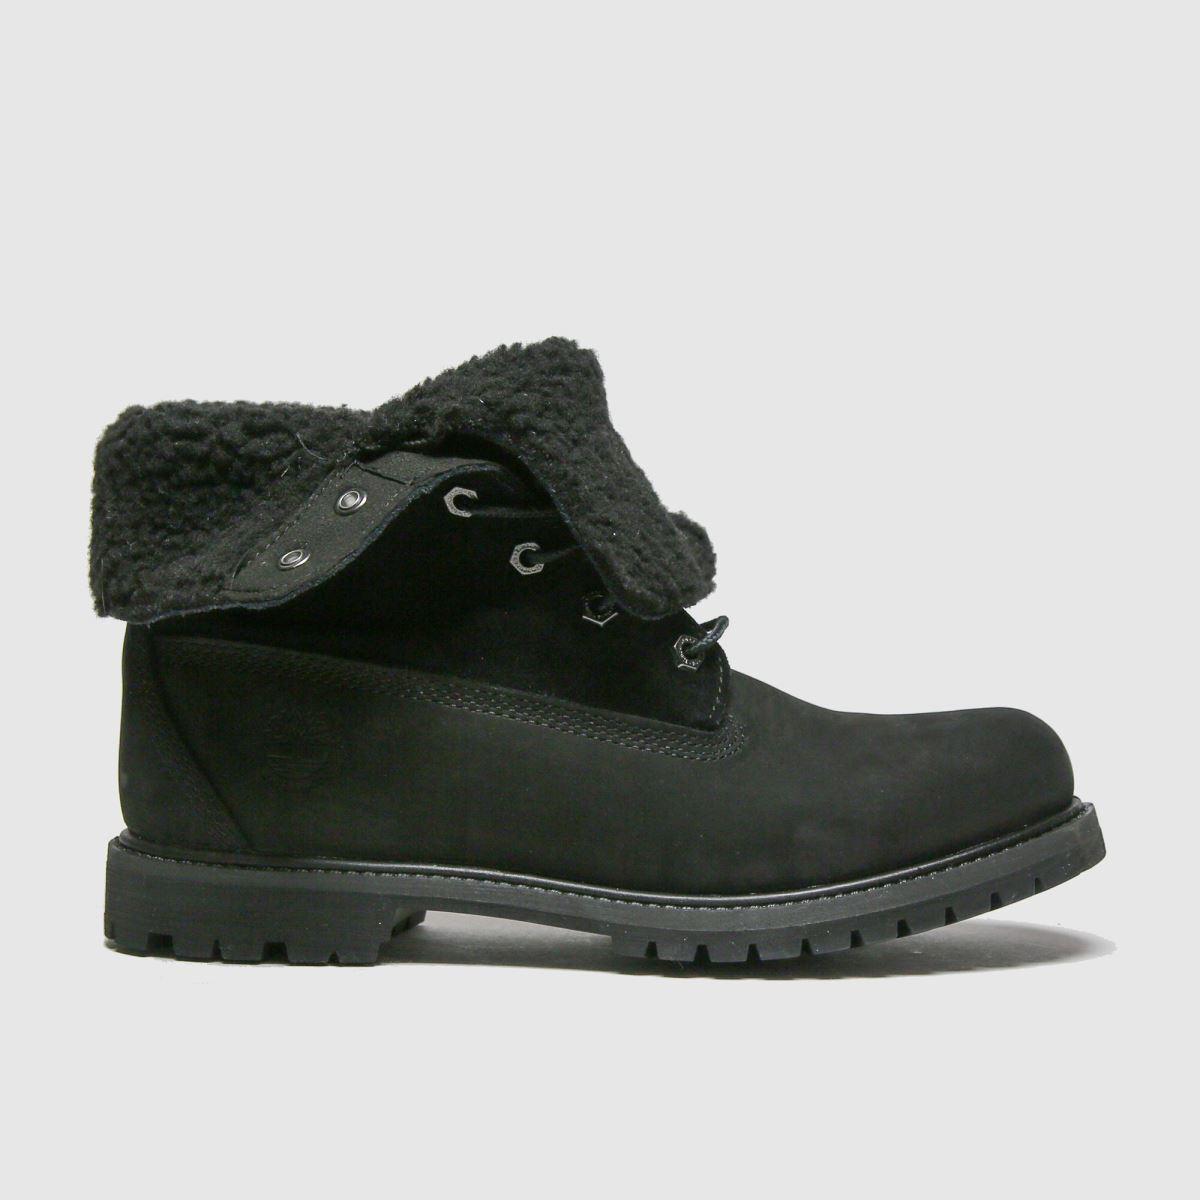 Timberland Black Authentic Teddy Fleece Boots